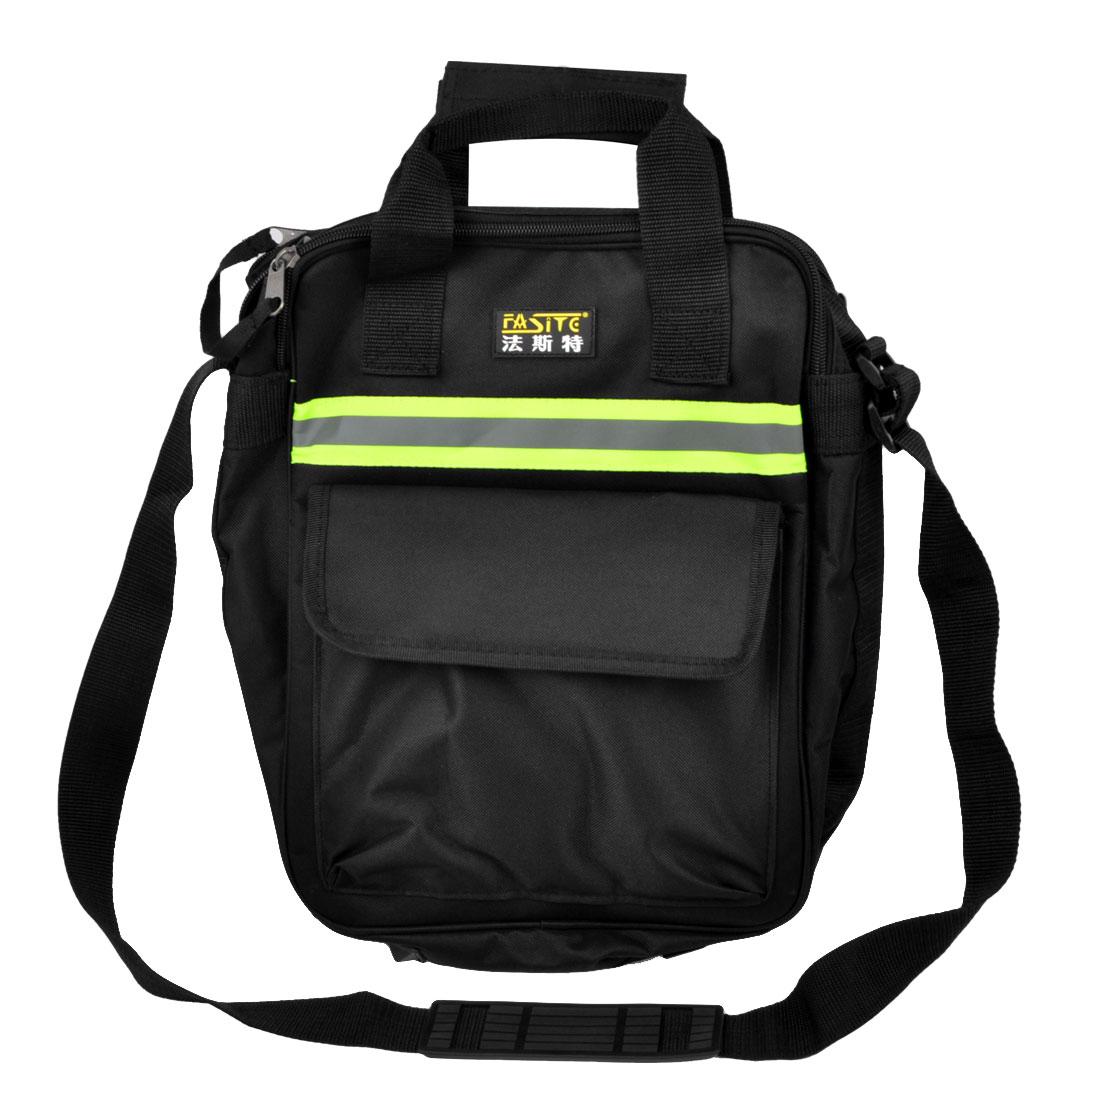 Black Nylon Oxford 4 Main Compartments Pliers Screwdriver Tool Holder Bag